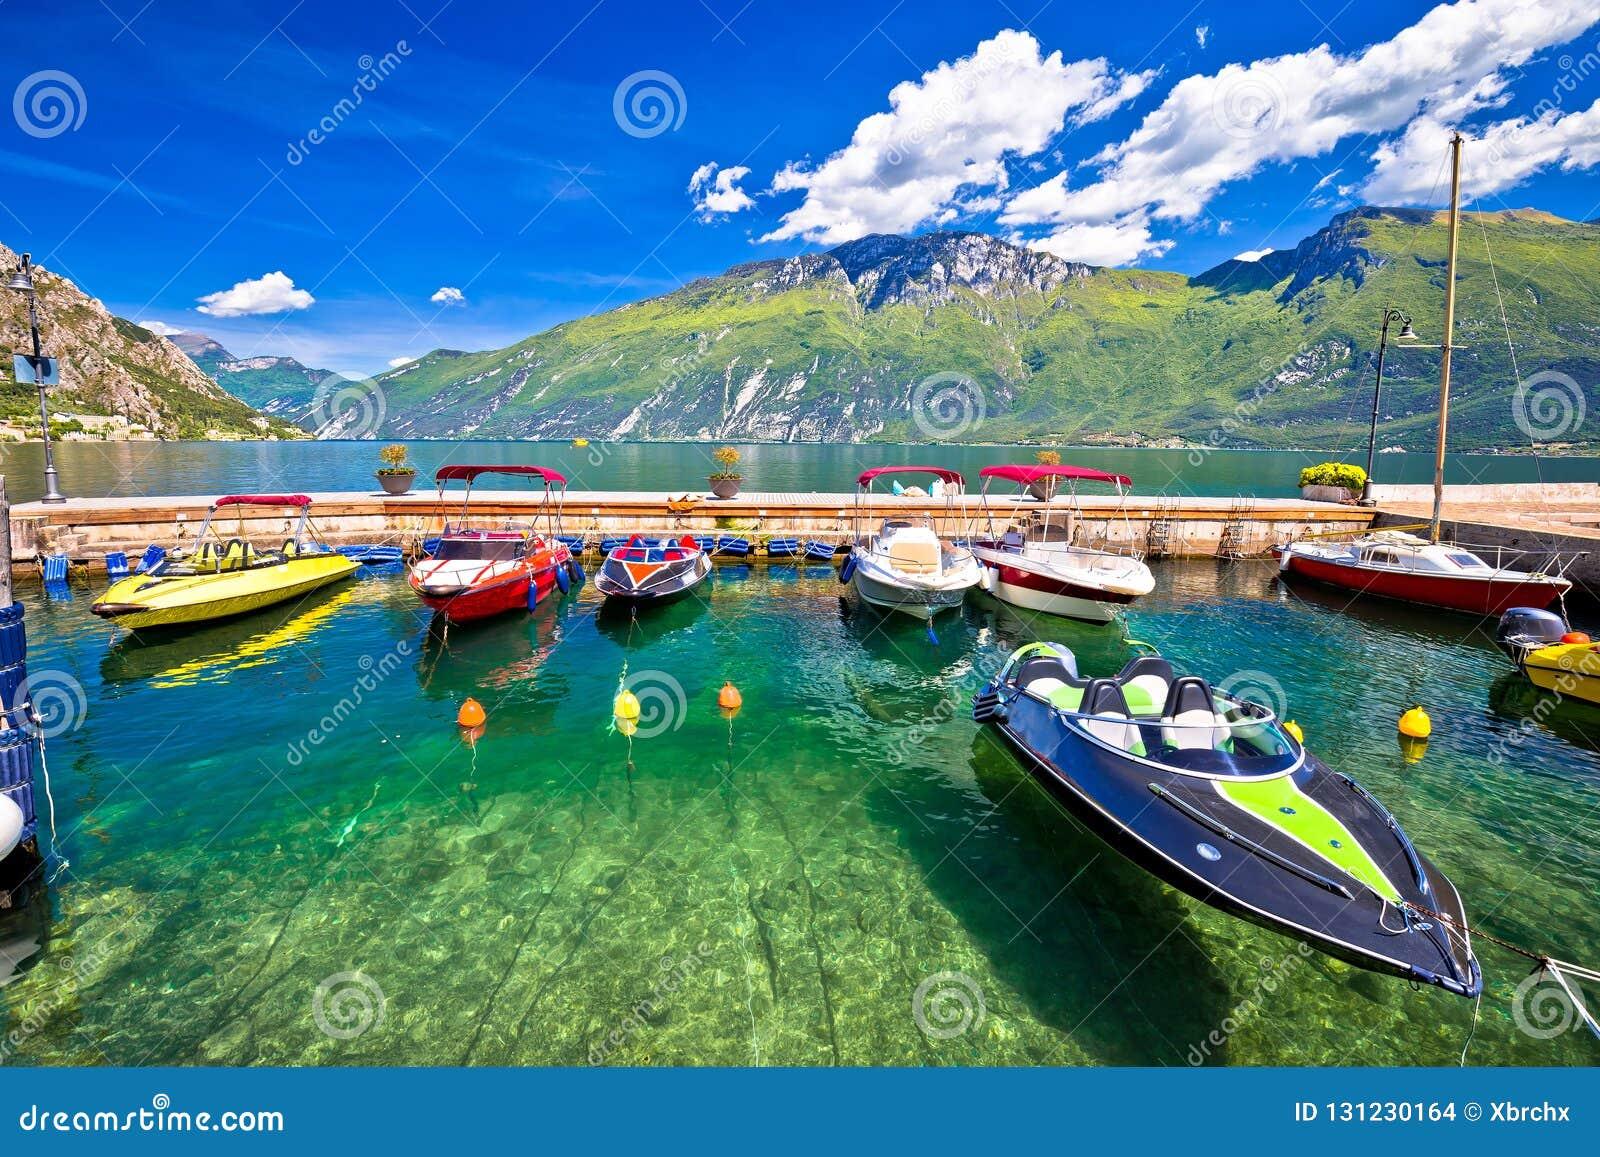 Speed Boats On Colorful Lago Di Garda Lake View, Stock Photo